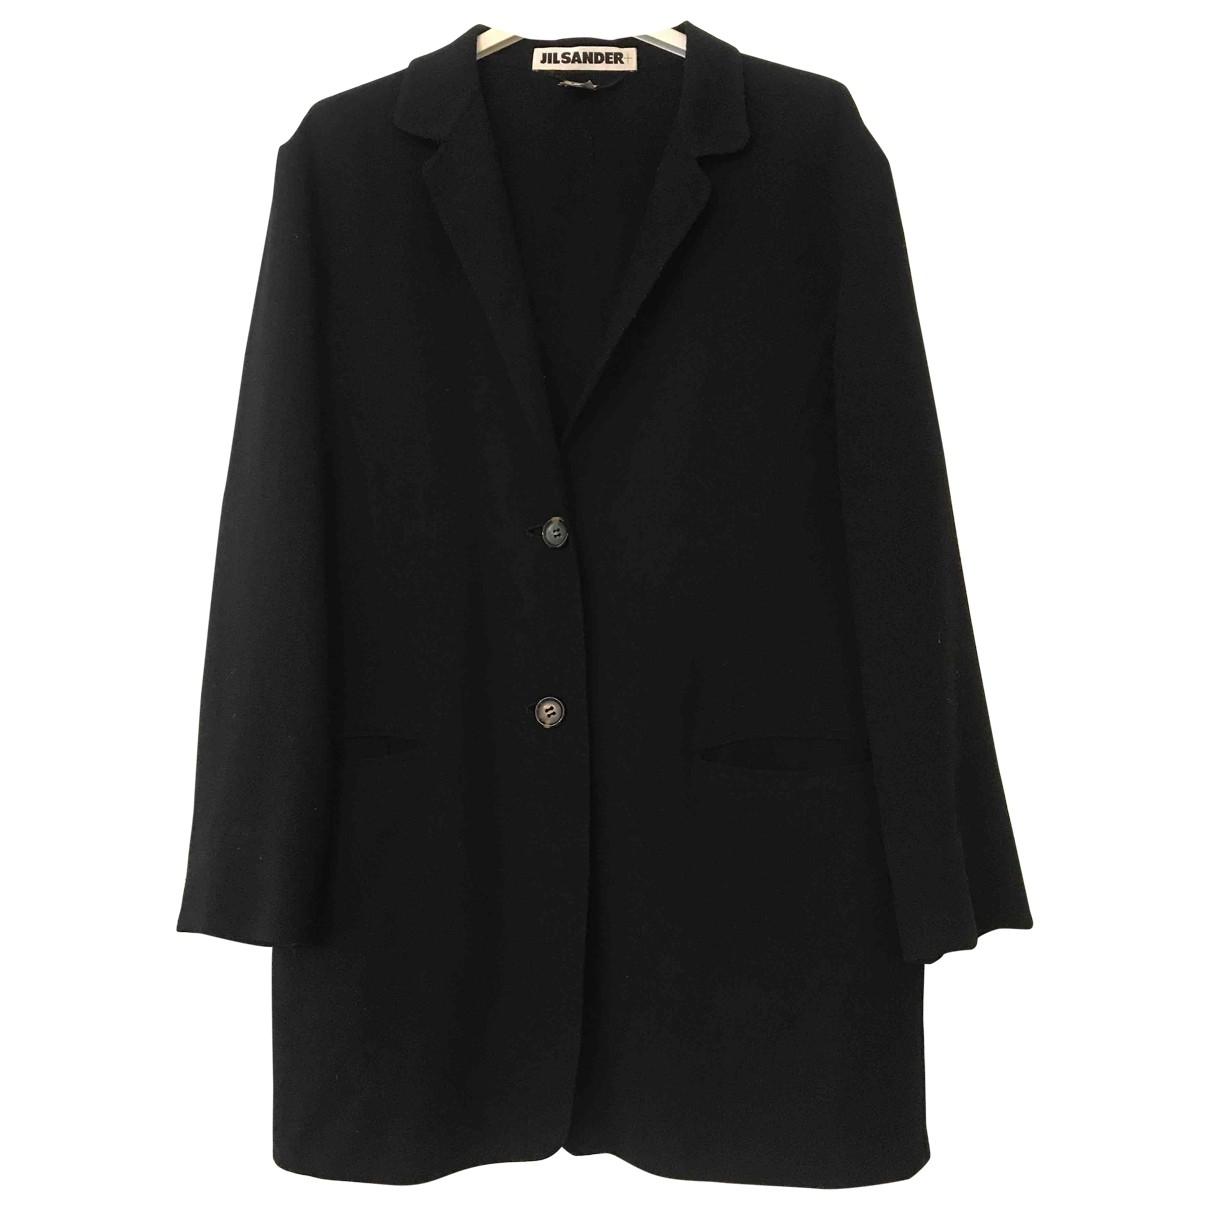 Jil Sander \N Black Wool jacket for Women 38 FR